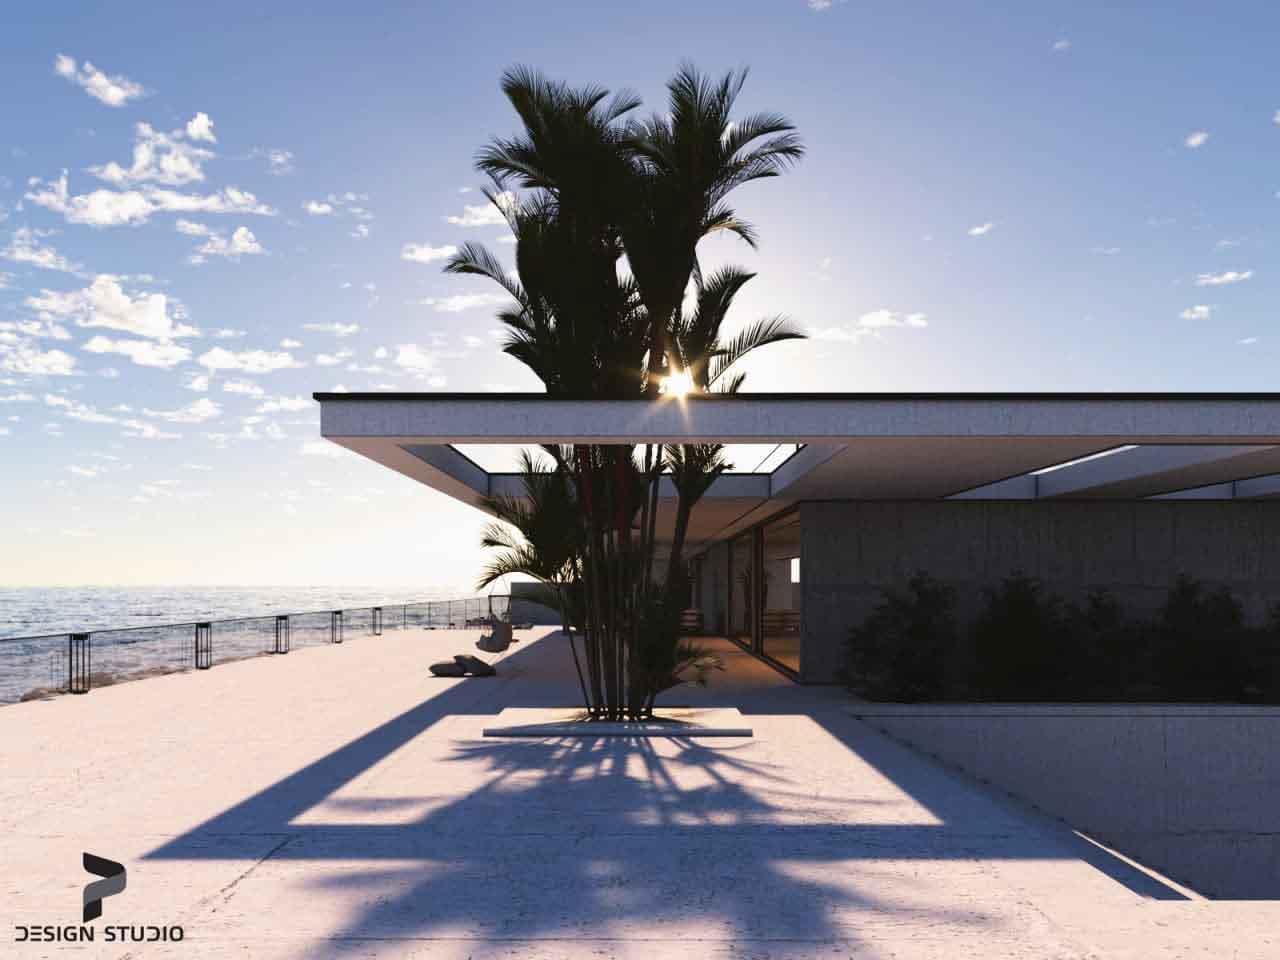 طراحی فول پکیج ویلای دوبلکس به سبک معماری مدرن واقع در اِزمیر ترکیه...